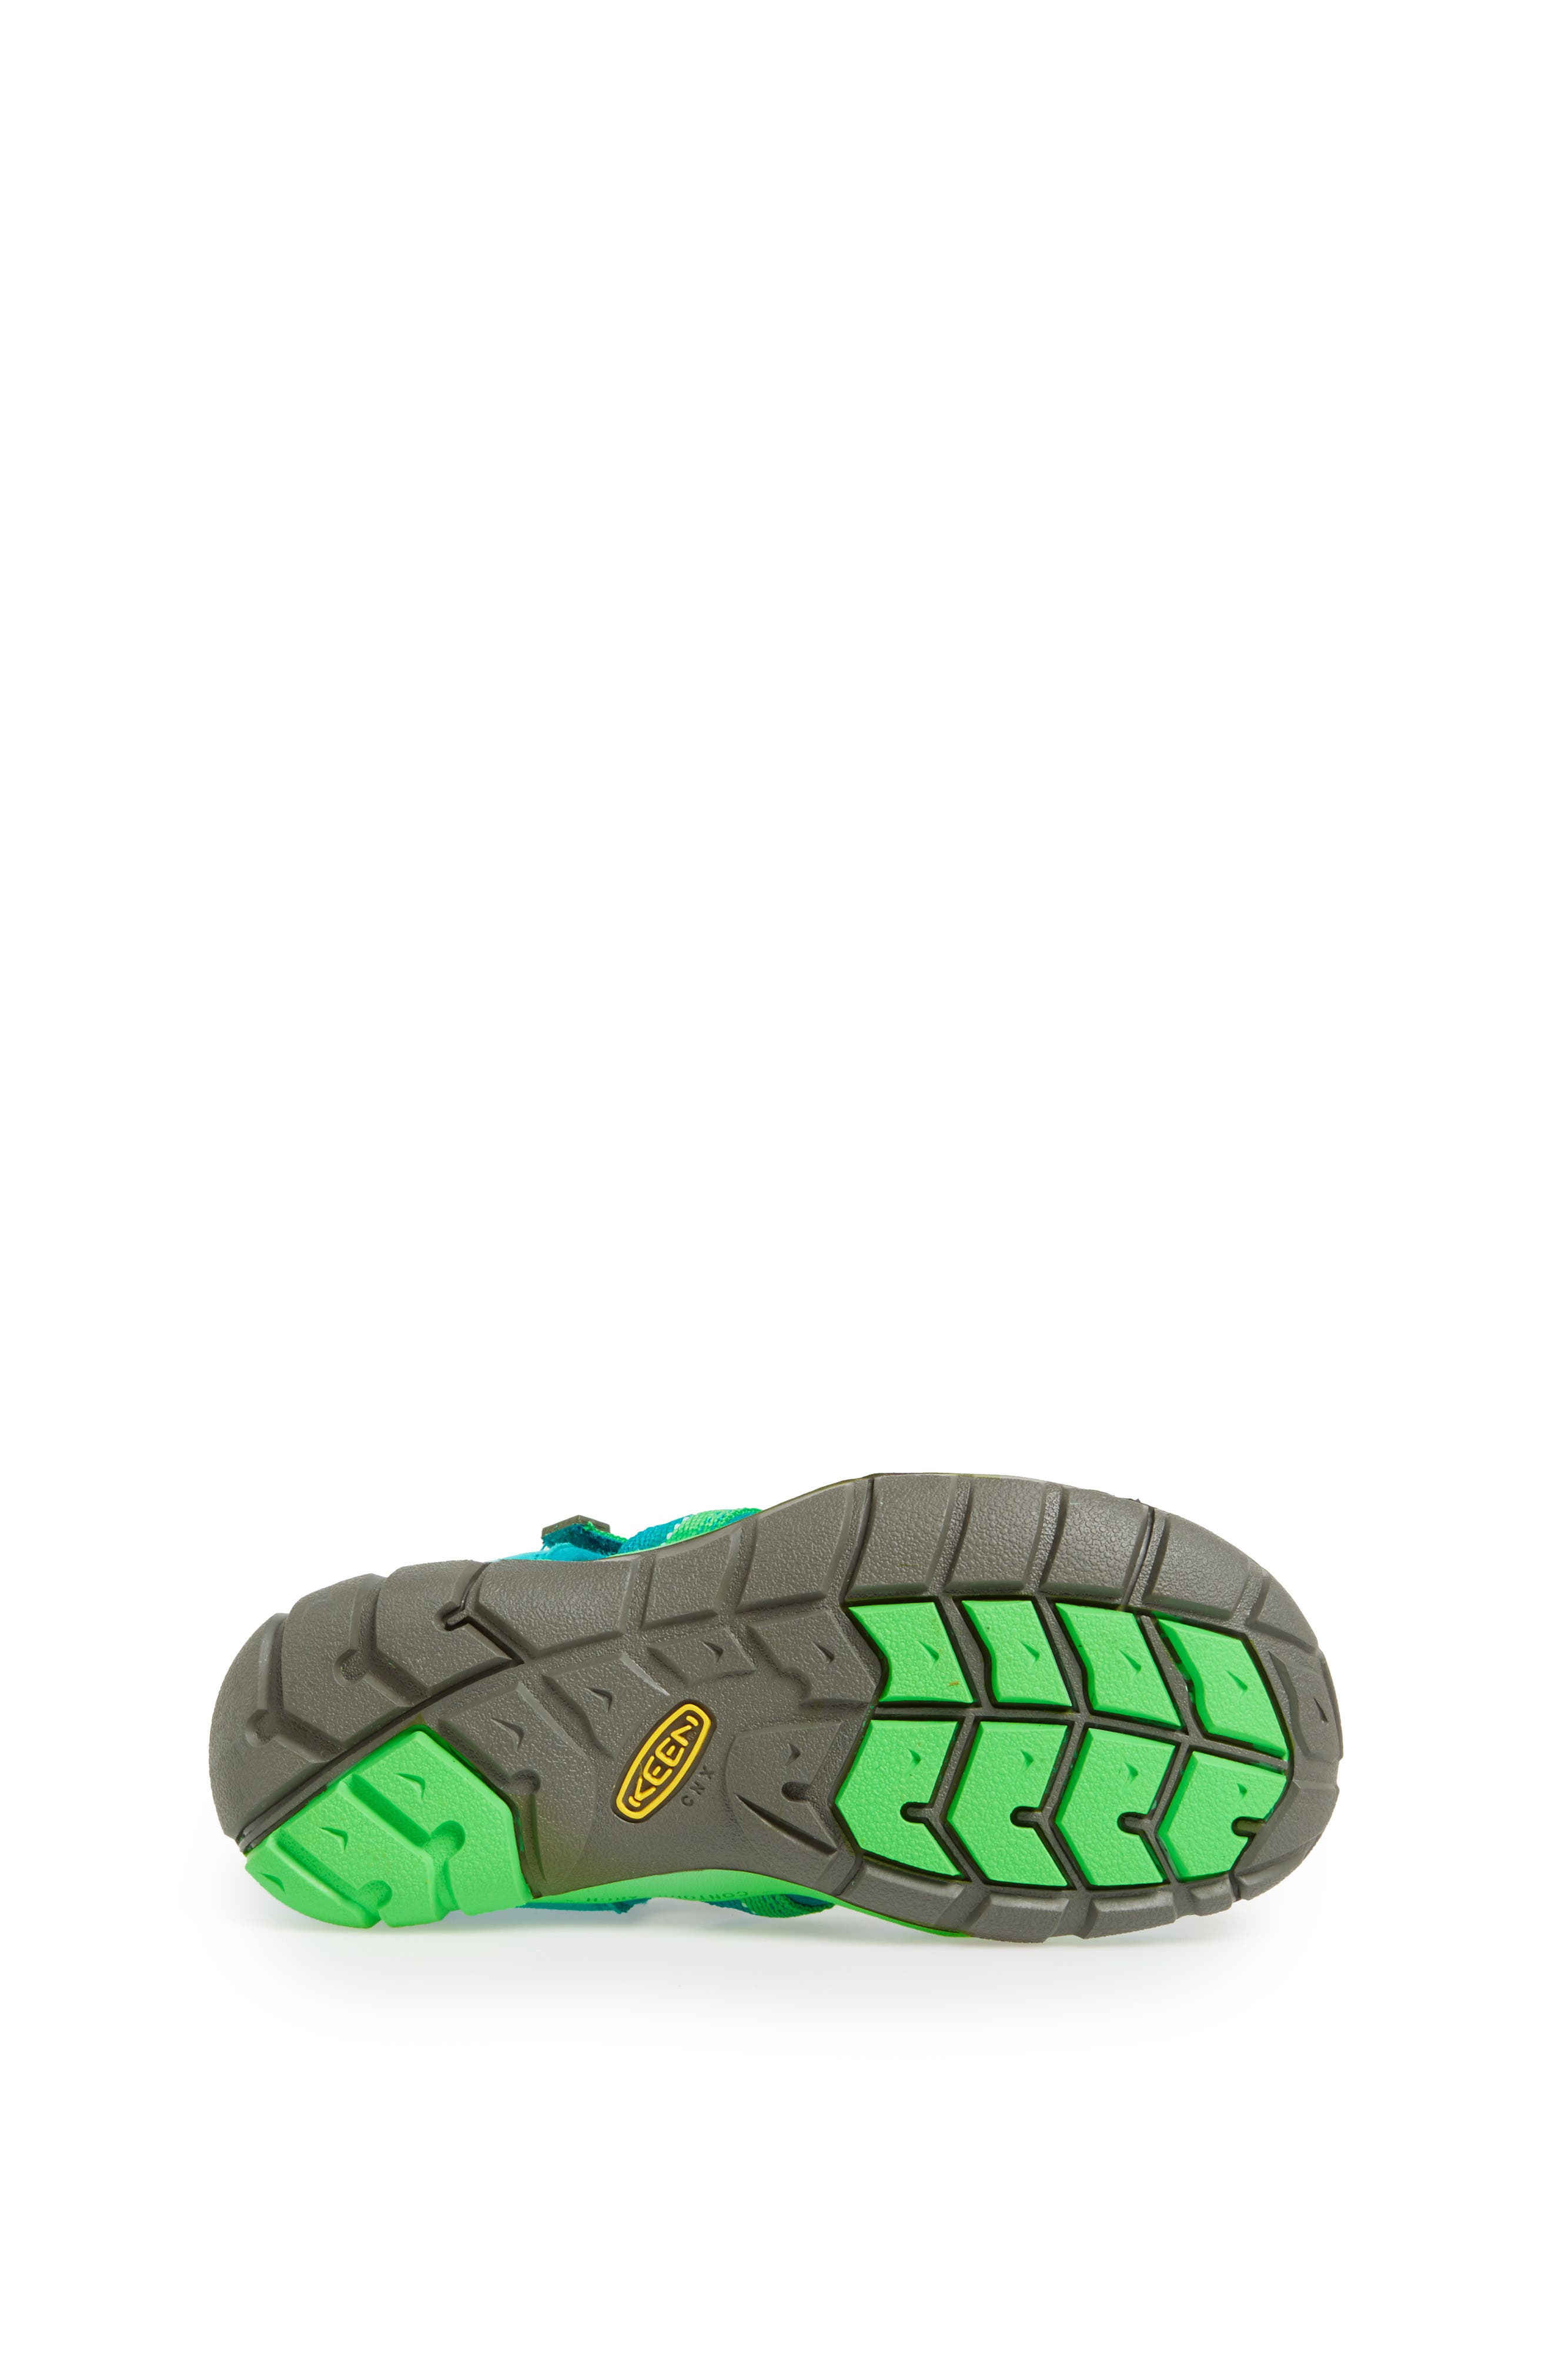 ,                             'Seacamp II' Water Friendly Sandal,                             Alternate thumbnail 195, color,                             435